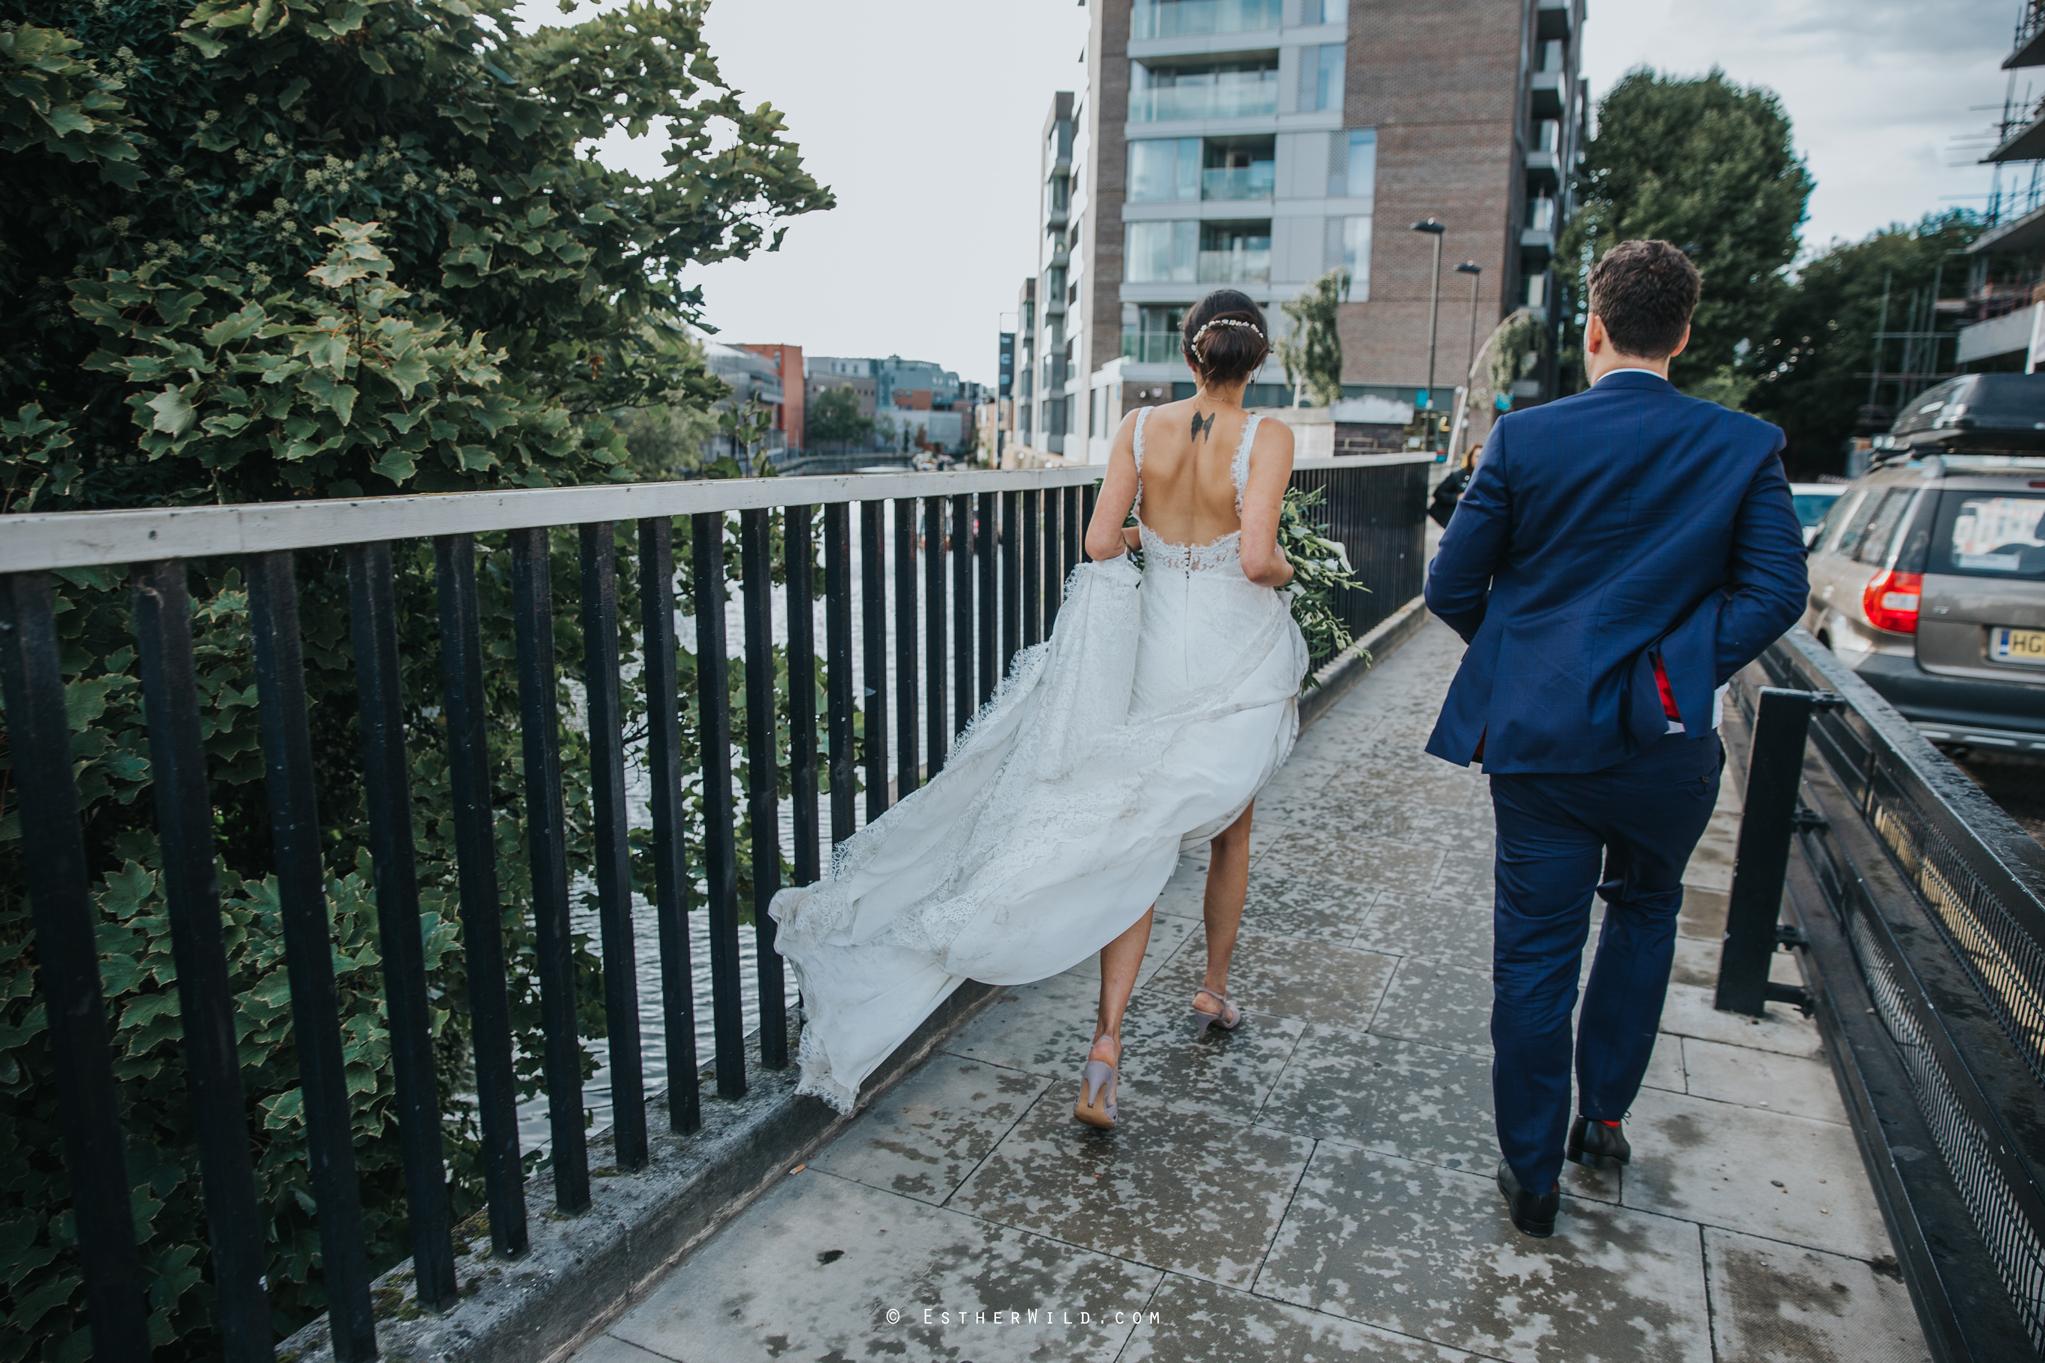 0917_London_Camden_Islington_Bus_Vintage_Wedding_Esther_Wild_IMG_6676.jpg